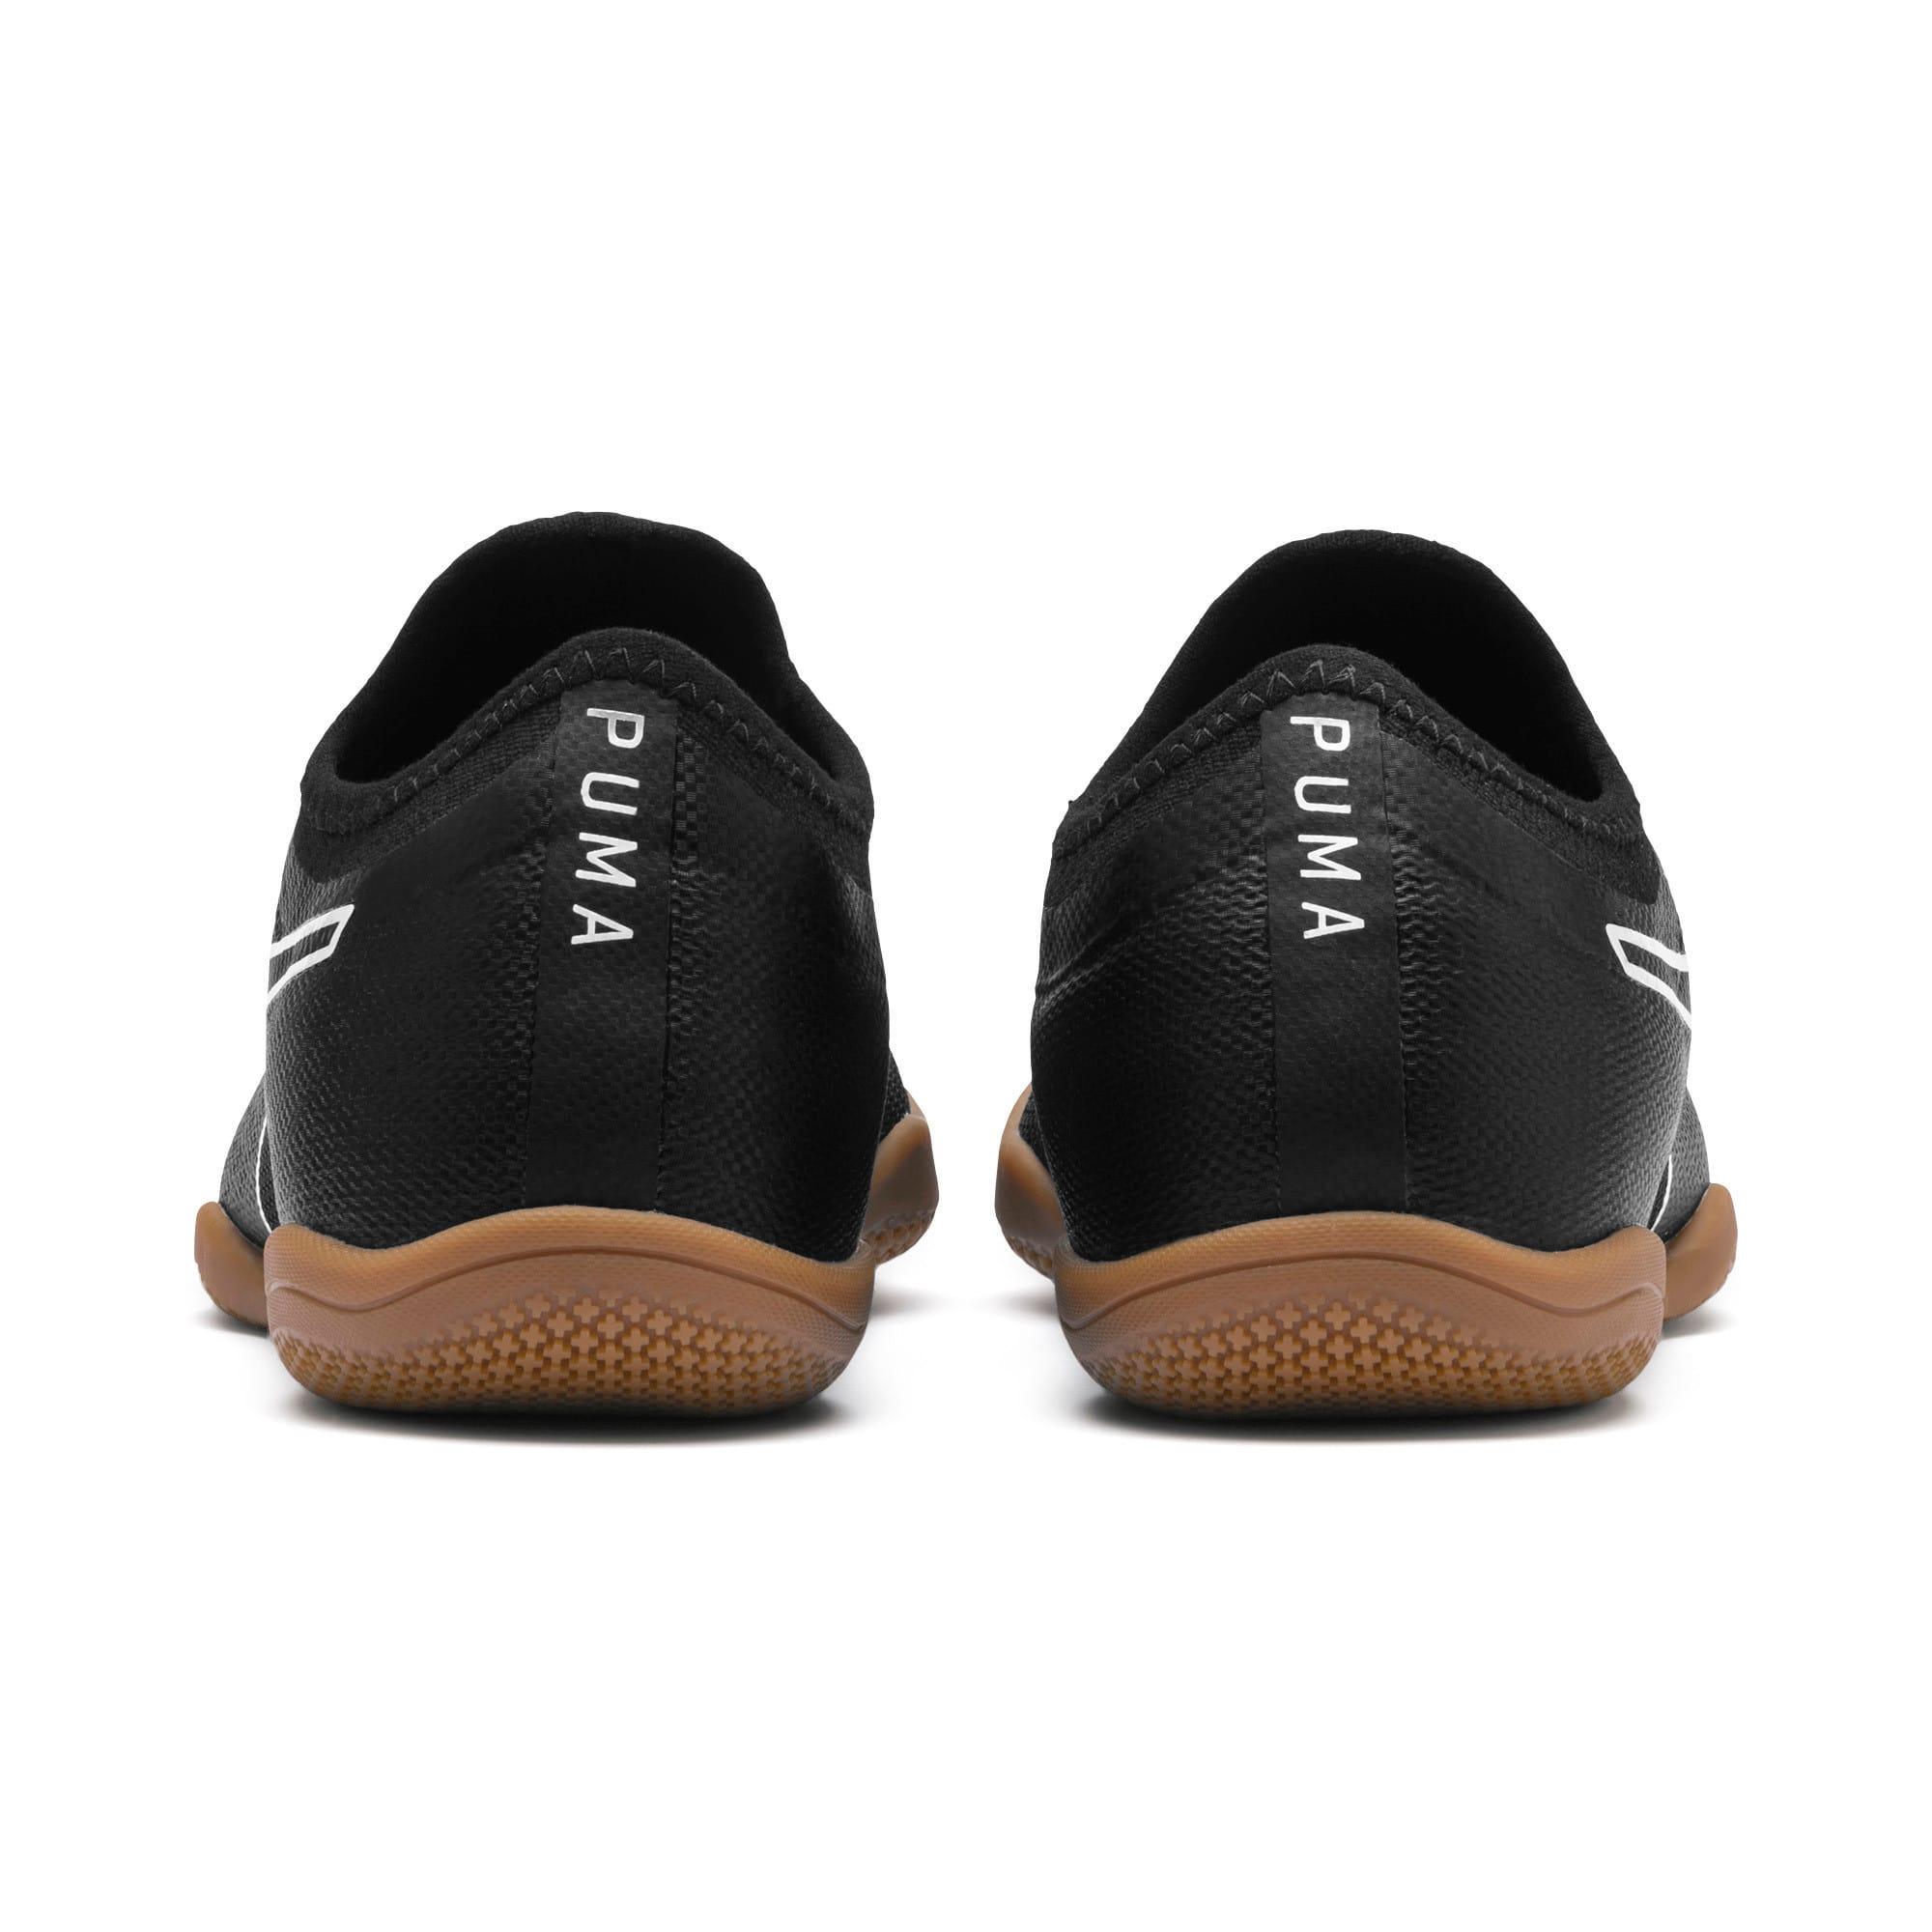 Thumbnail 4 of 365 Sala 1 Men's Soccer Shoes, Puma Black-Puma White-Gum, medium